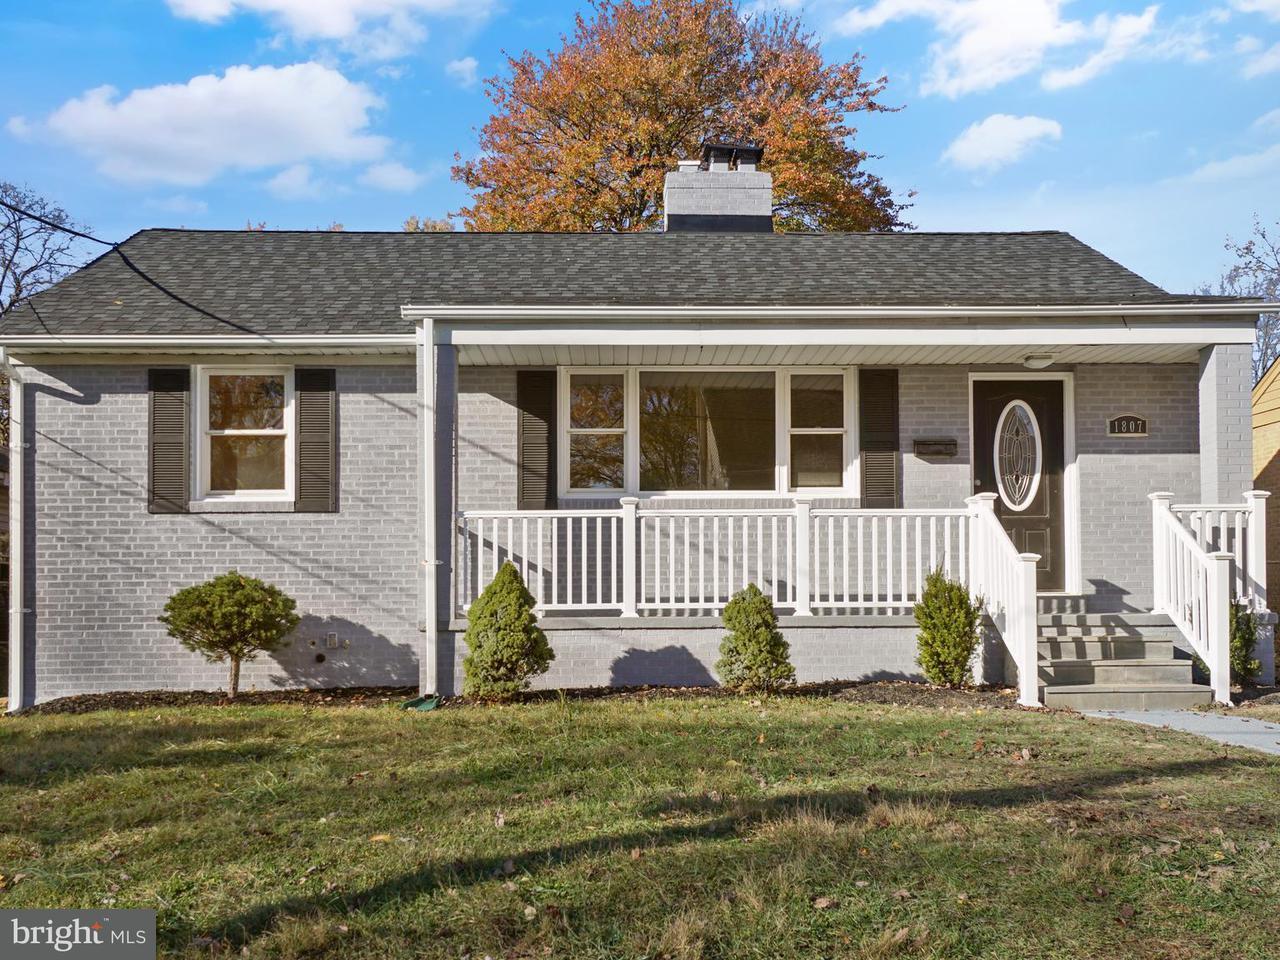 Single Family Home for Sale at 1807 ELDON Lane 1807 ELDON Lane Silver Spring, Maryland 20902 United States